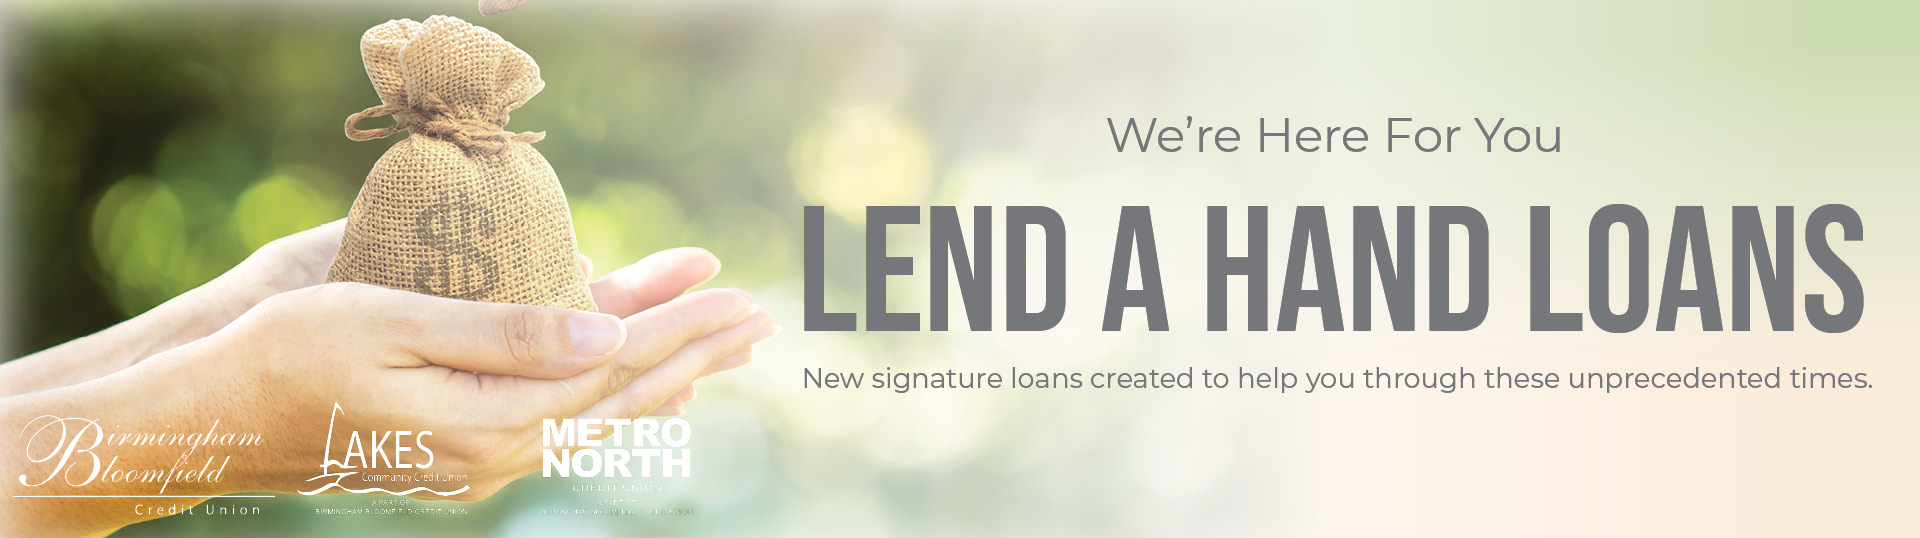 Lend A Hand Loans